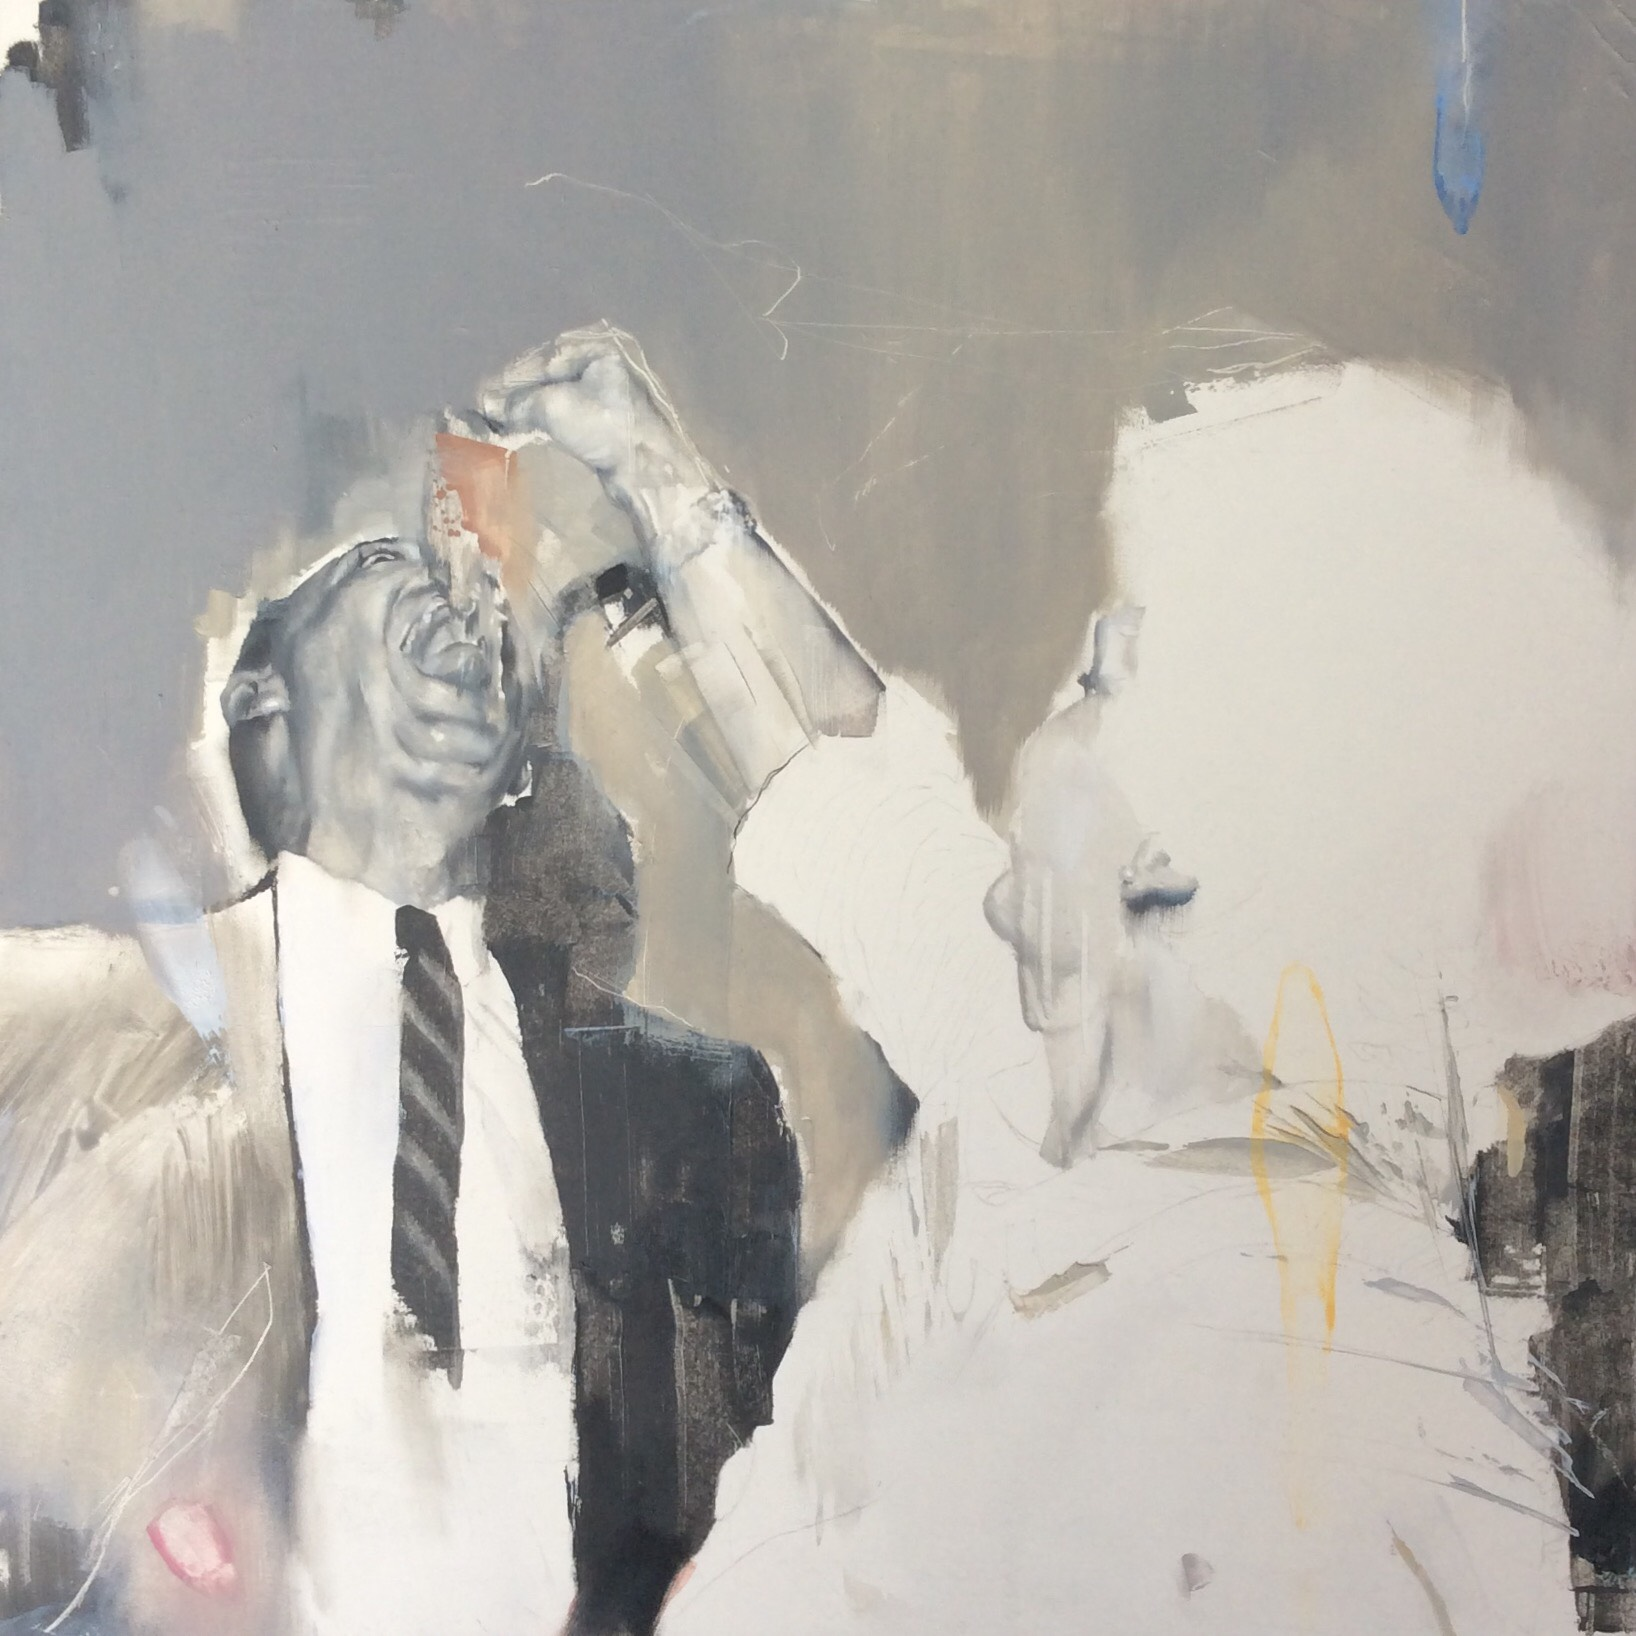 Angela Bell, Gulp, Oil on gesso panel, 25x25x1,  http://www.angebellart.com